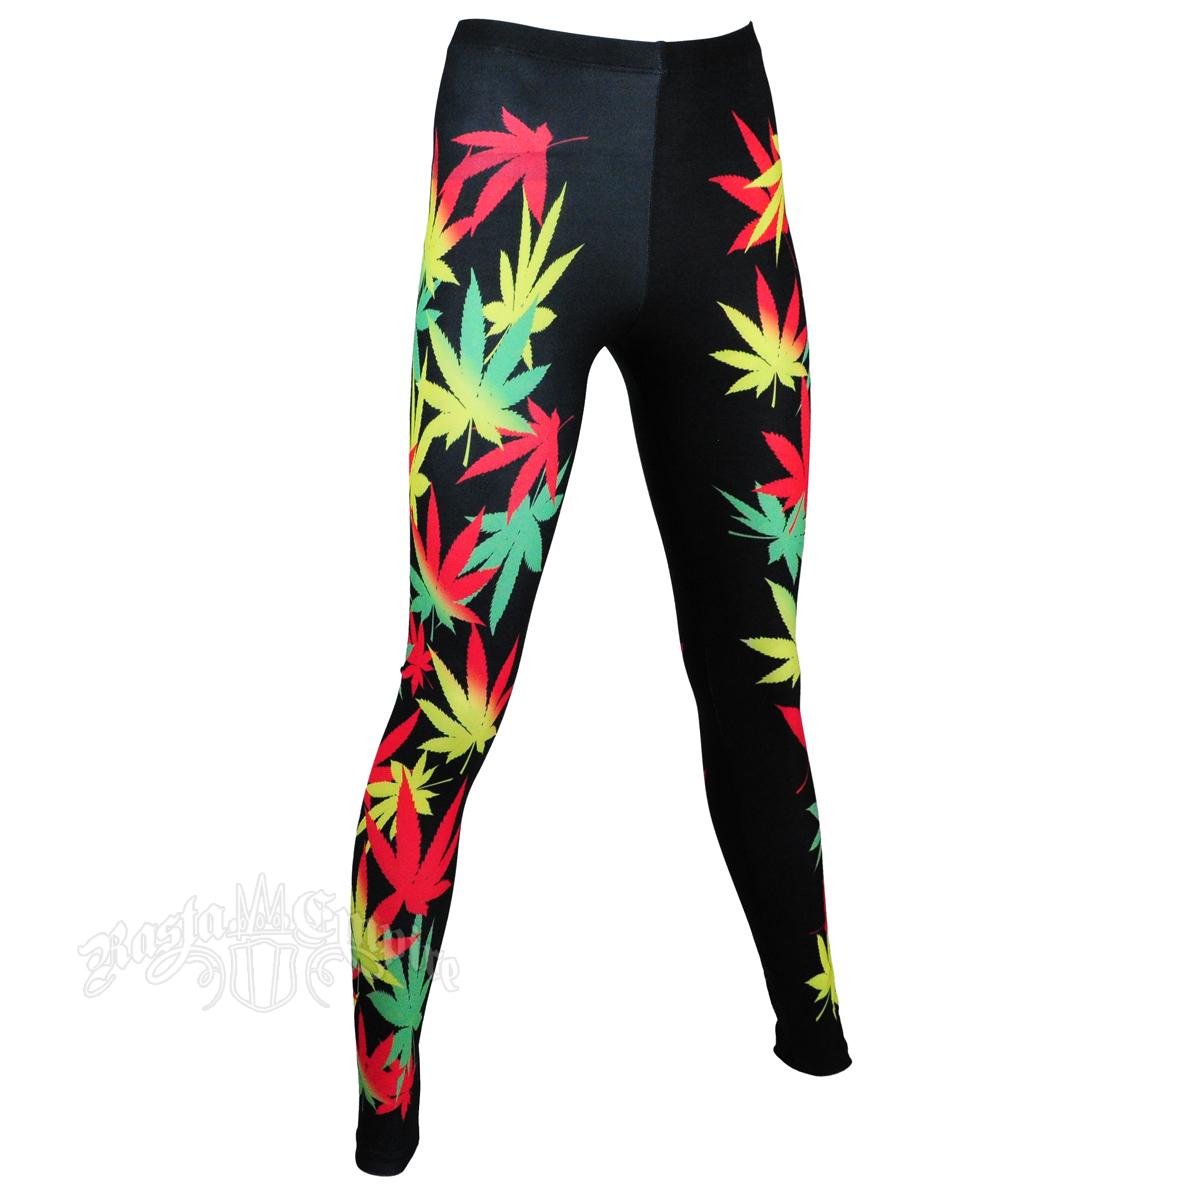 Rasta weed leggings @ RastaEmpire.com